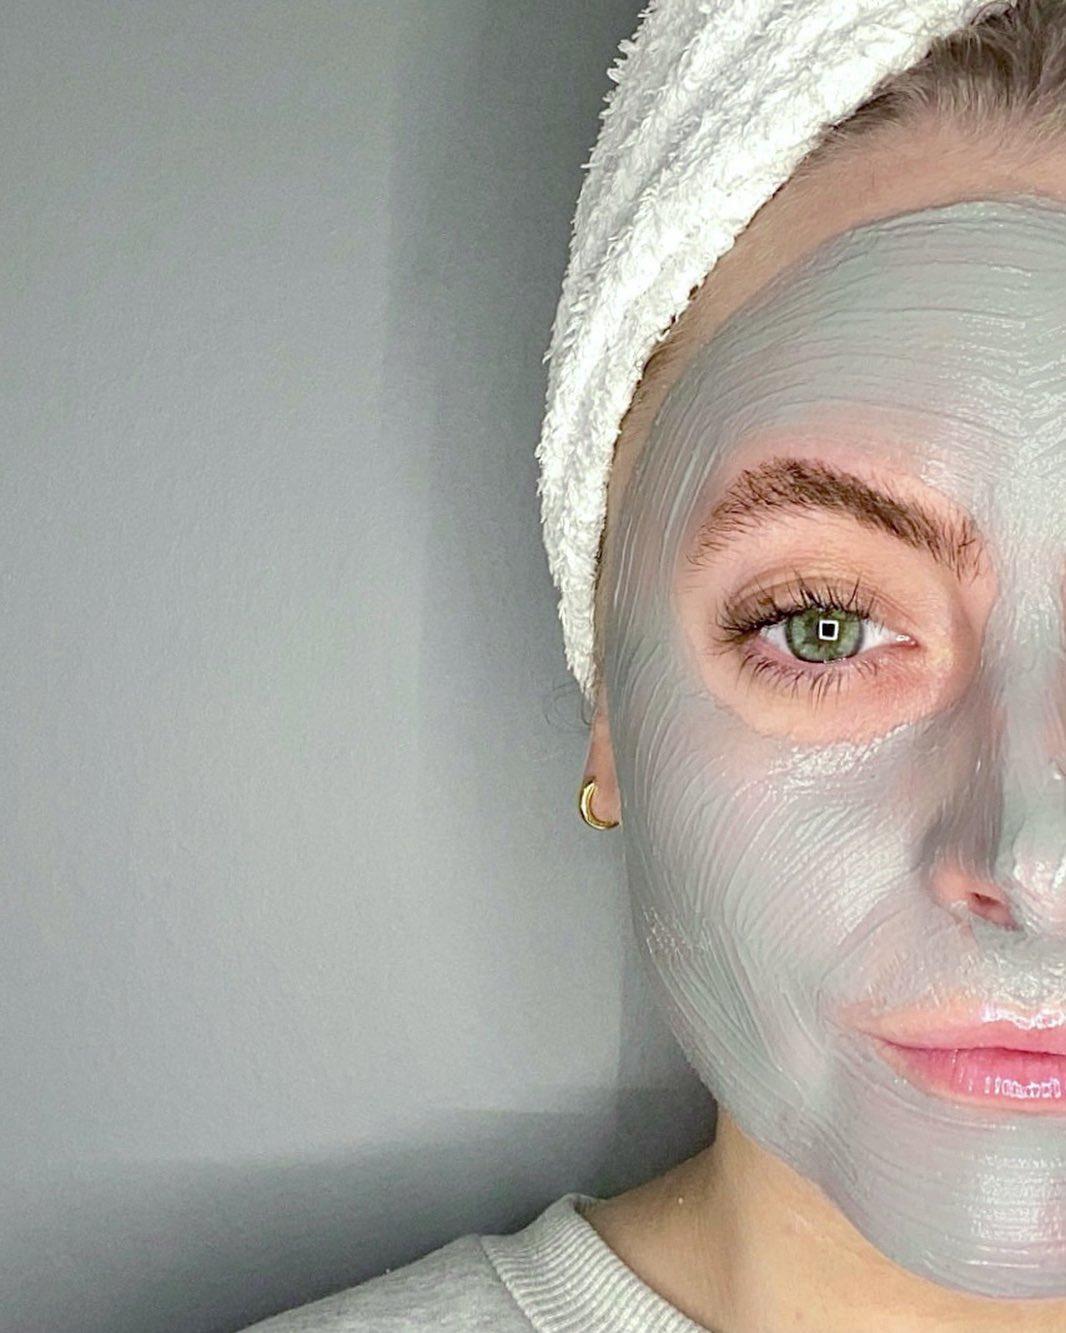 Women wearing a face mask